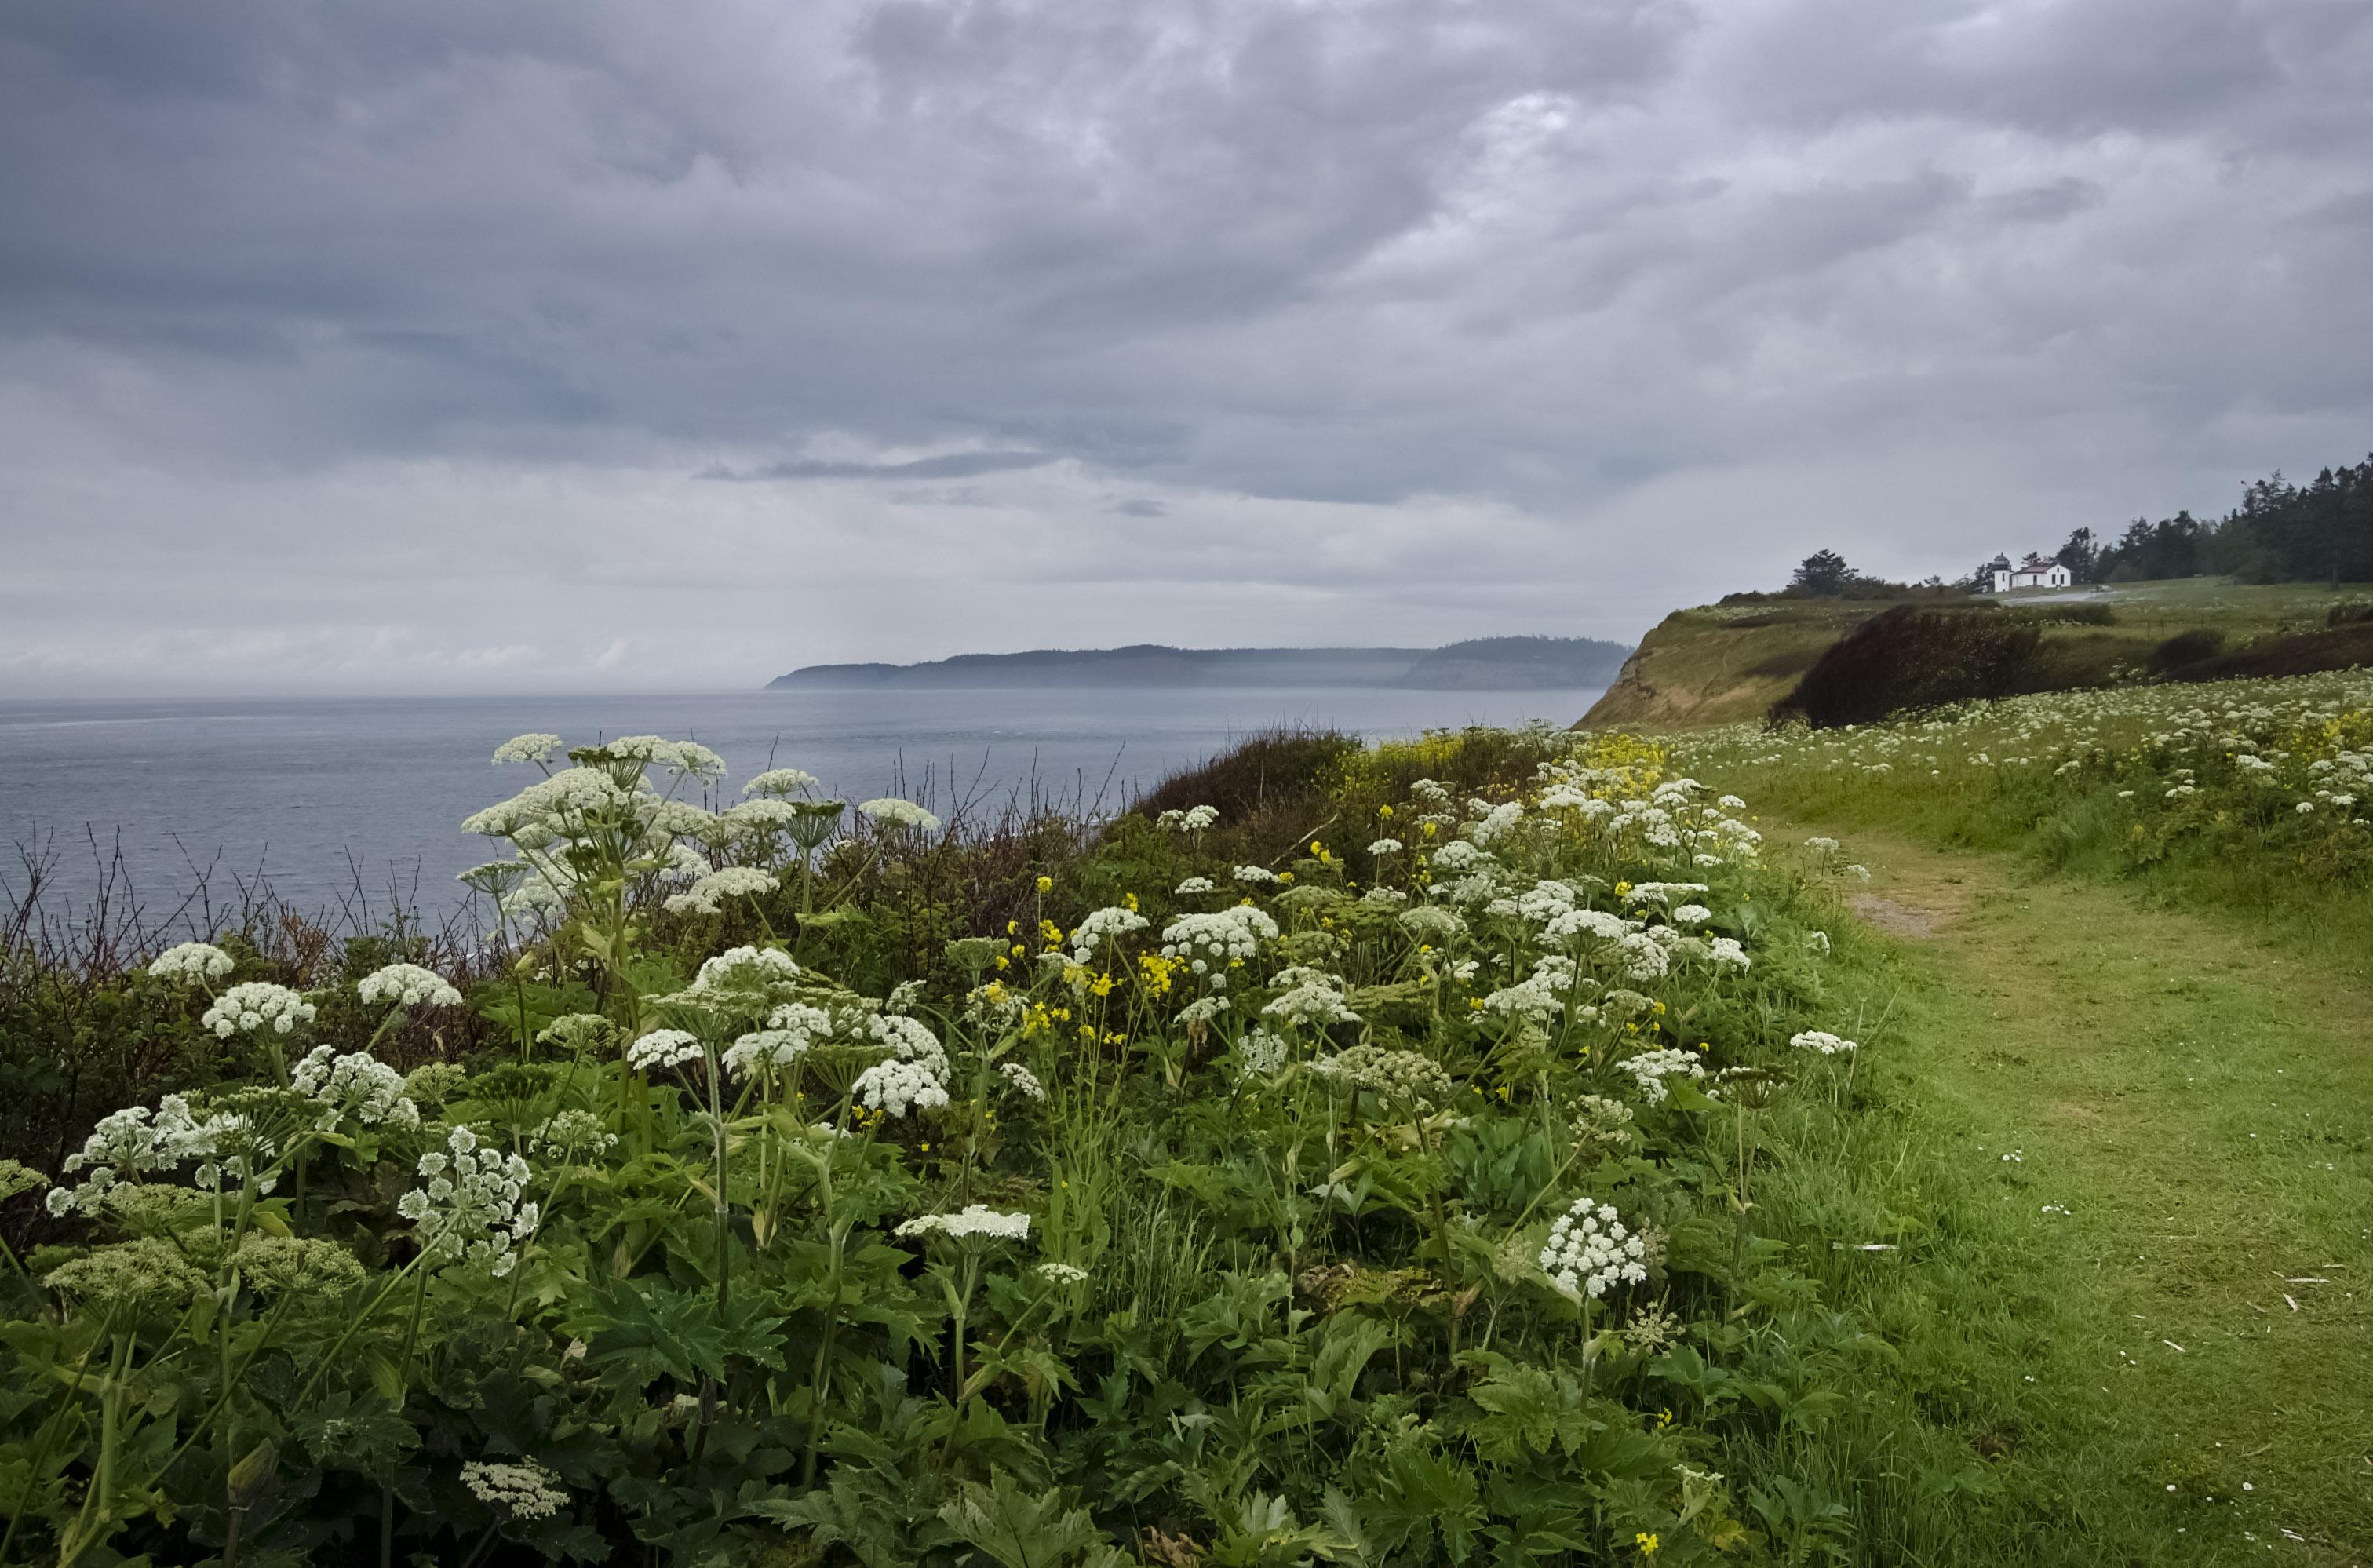 Blog - Writing On Whidbey Island